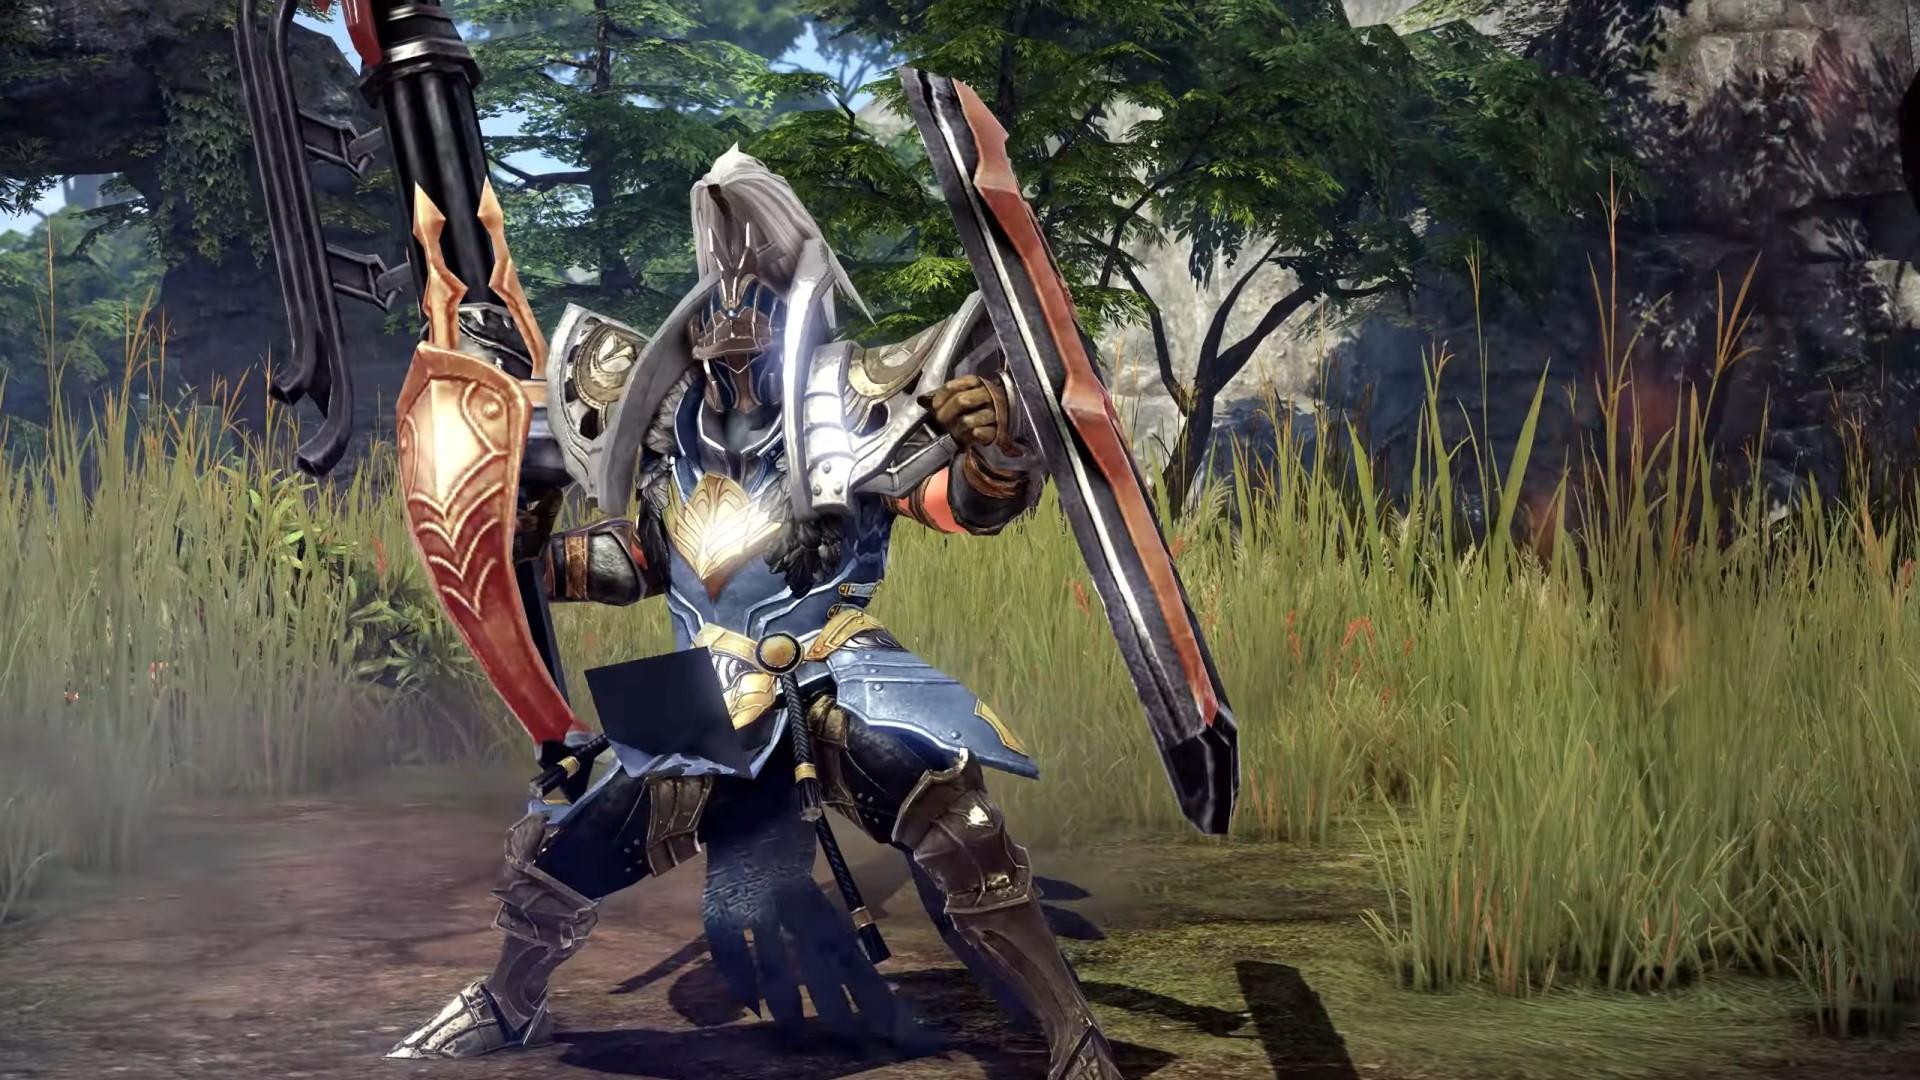 Lost Ark's warrior advanced classes all look very dangerous